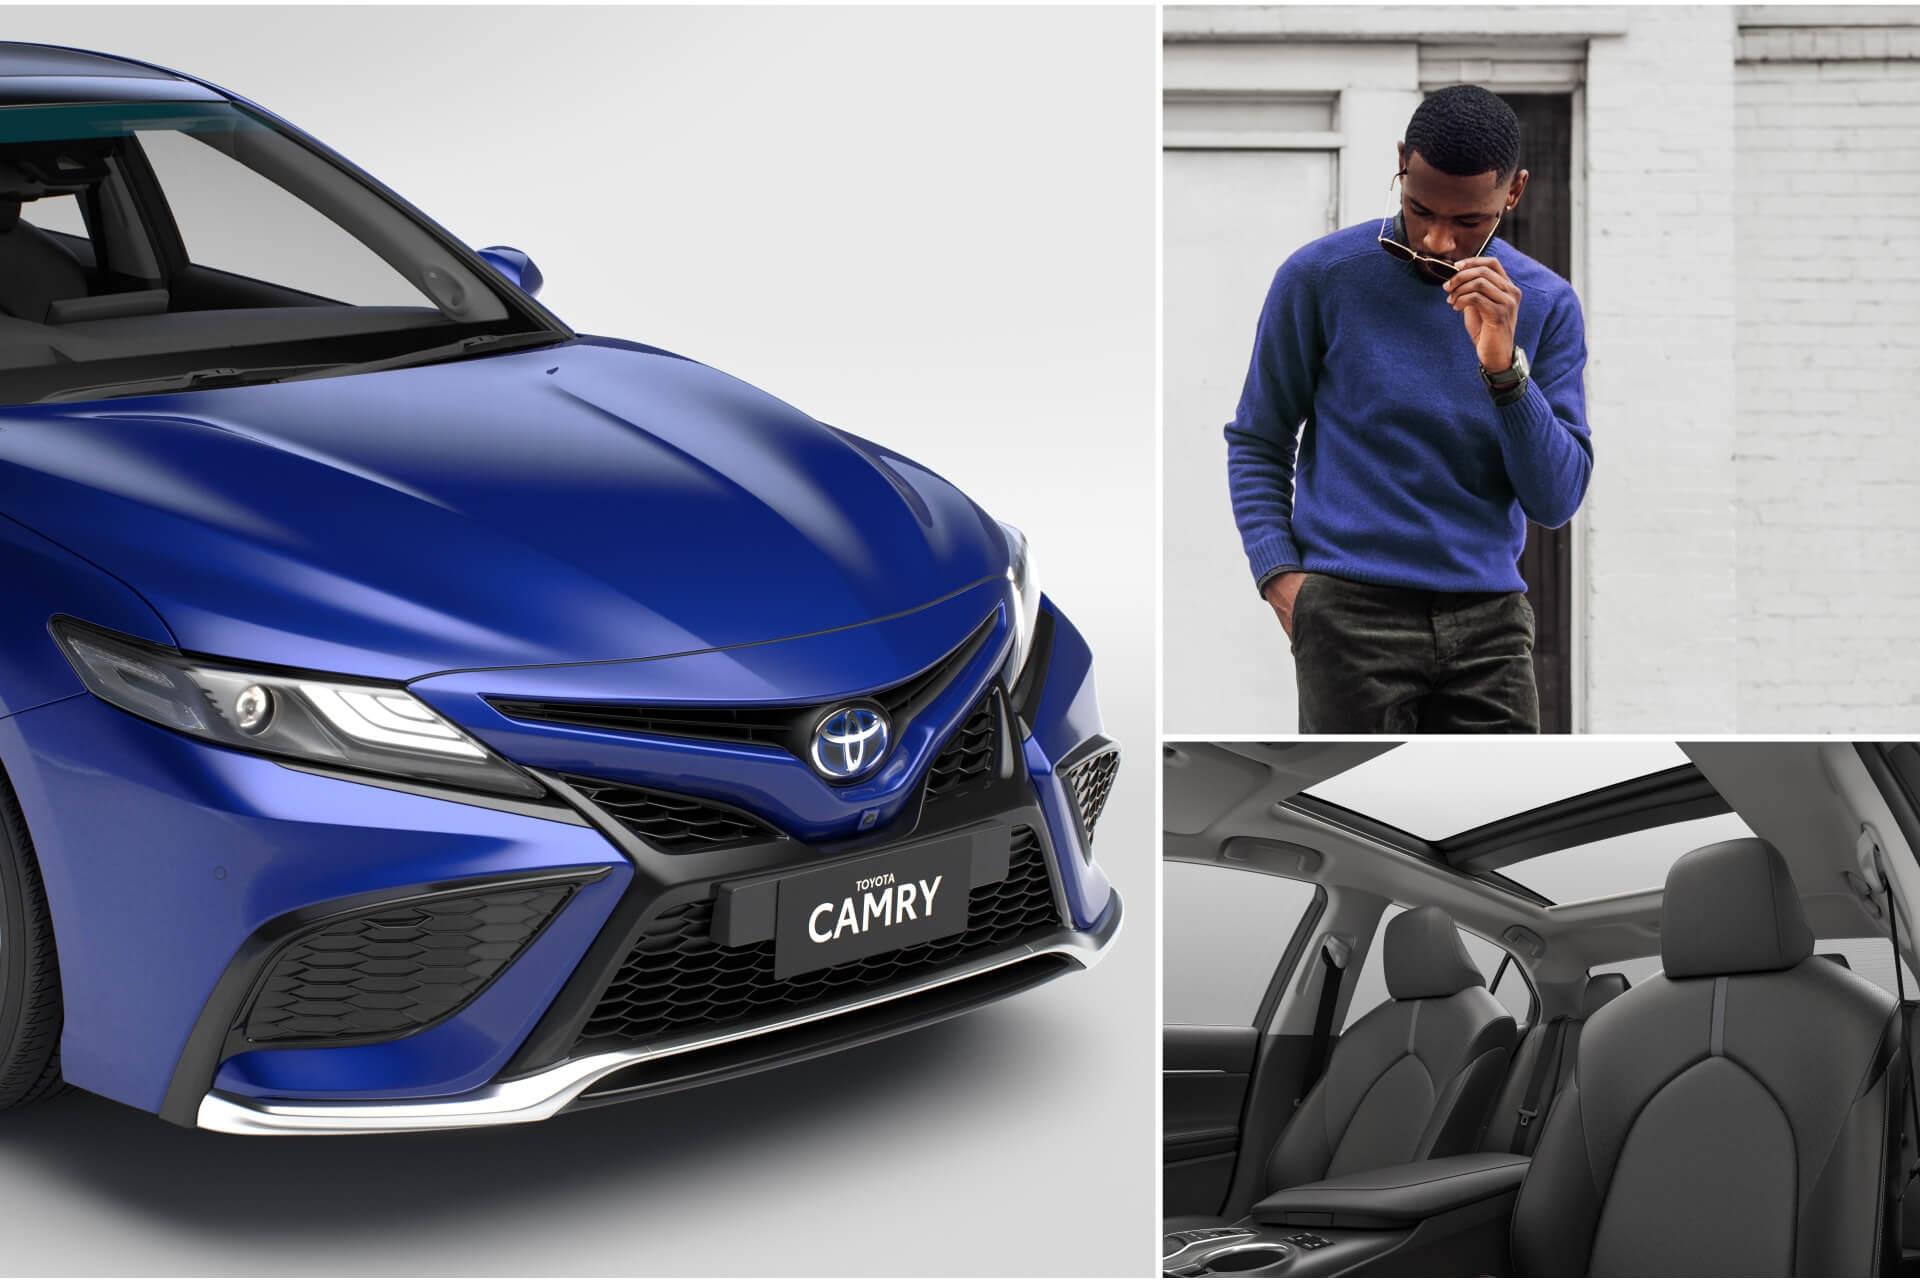 Toyota Camry Design and Interior